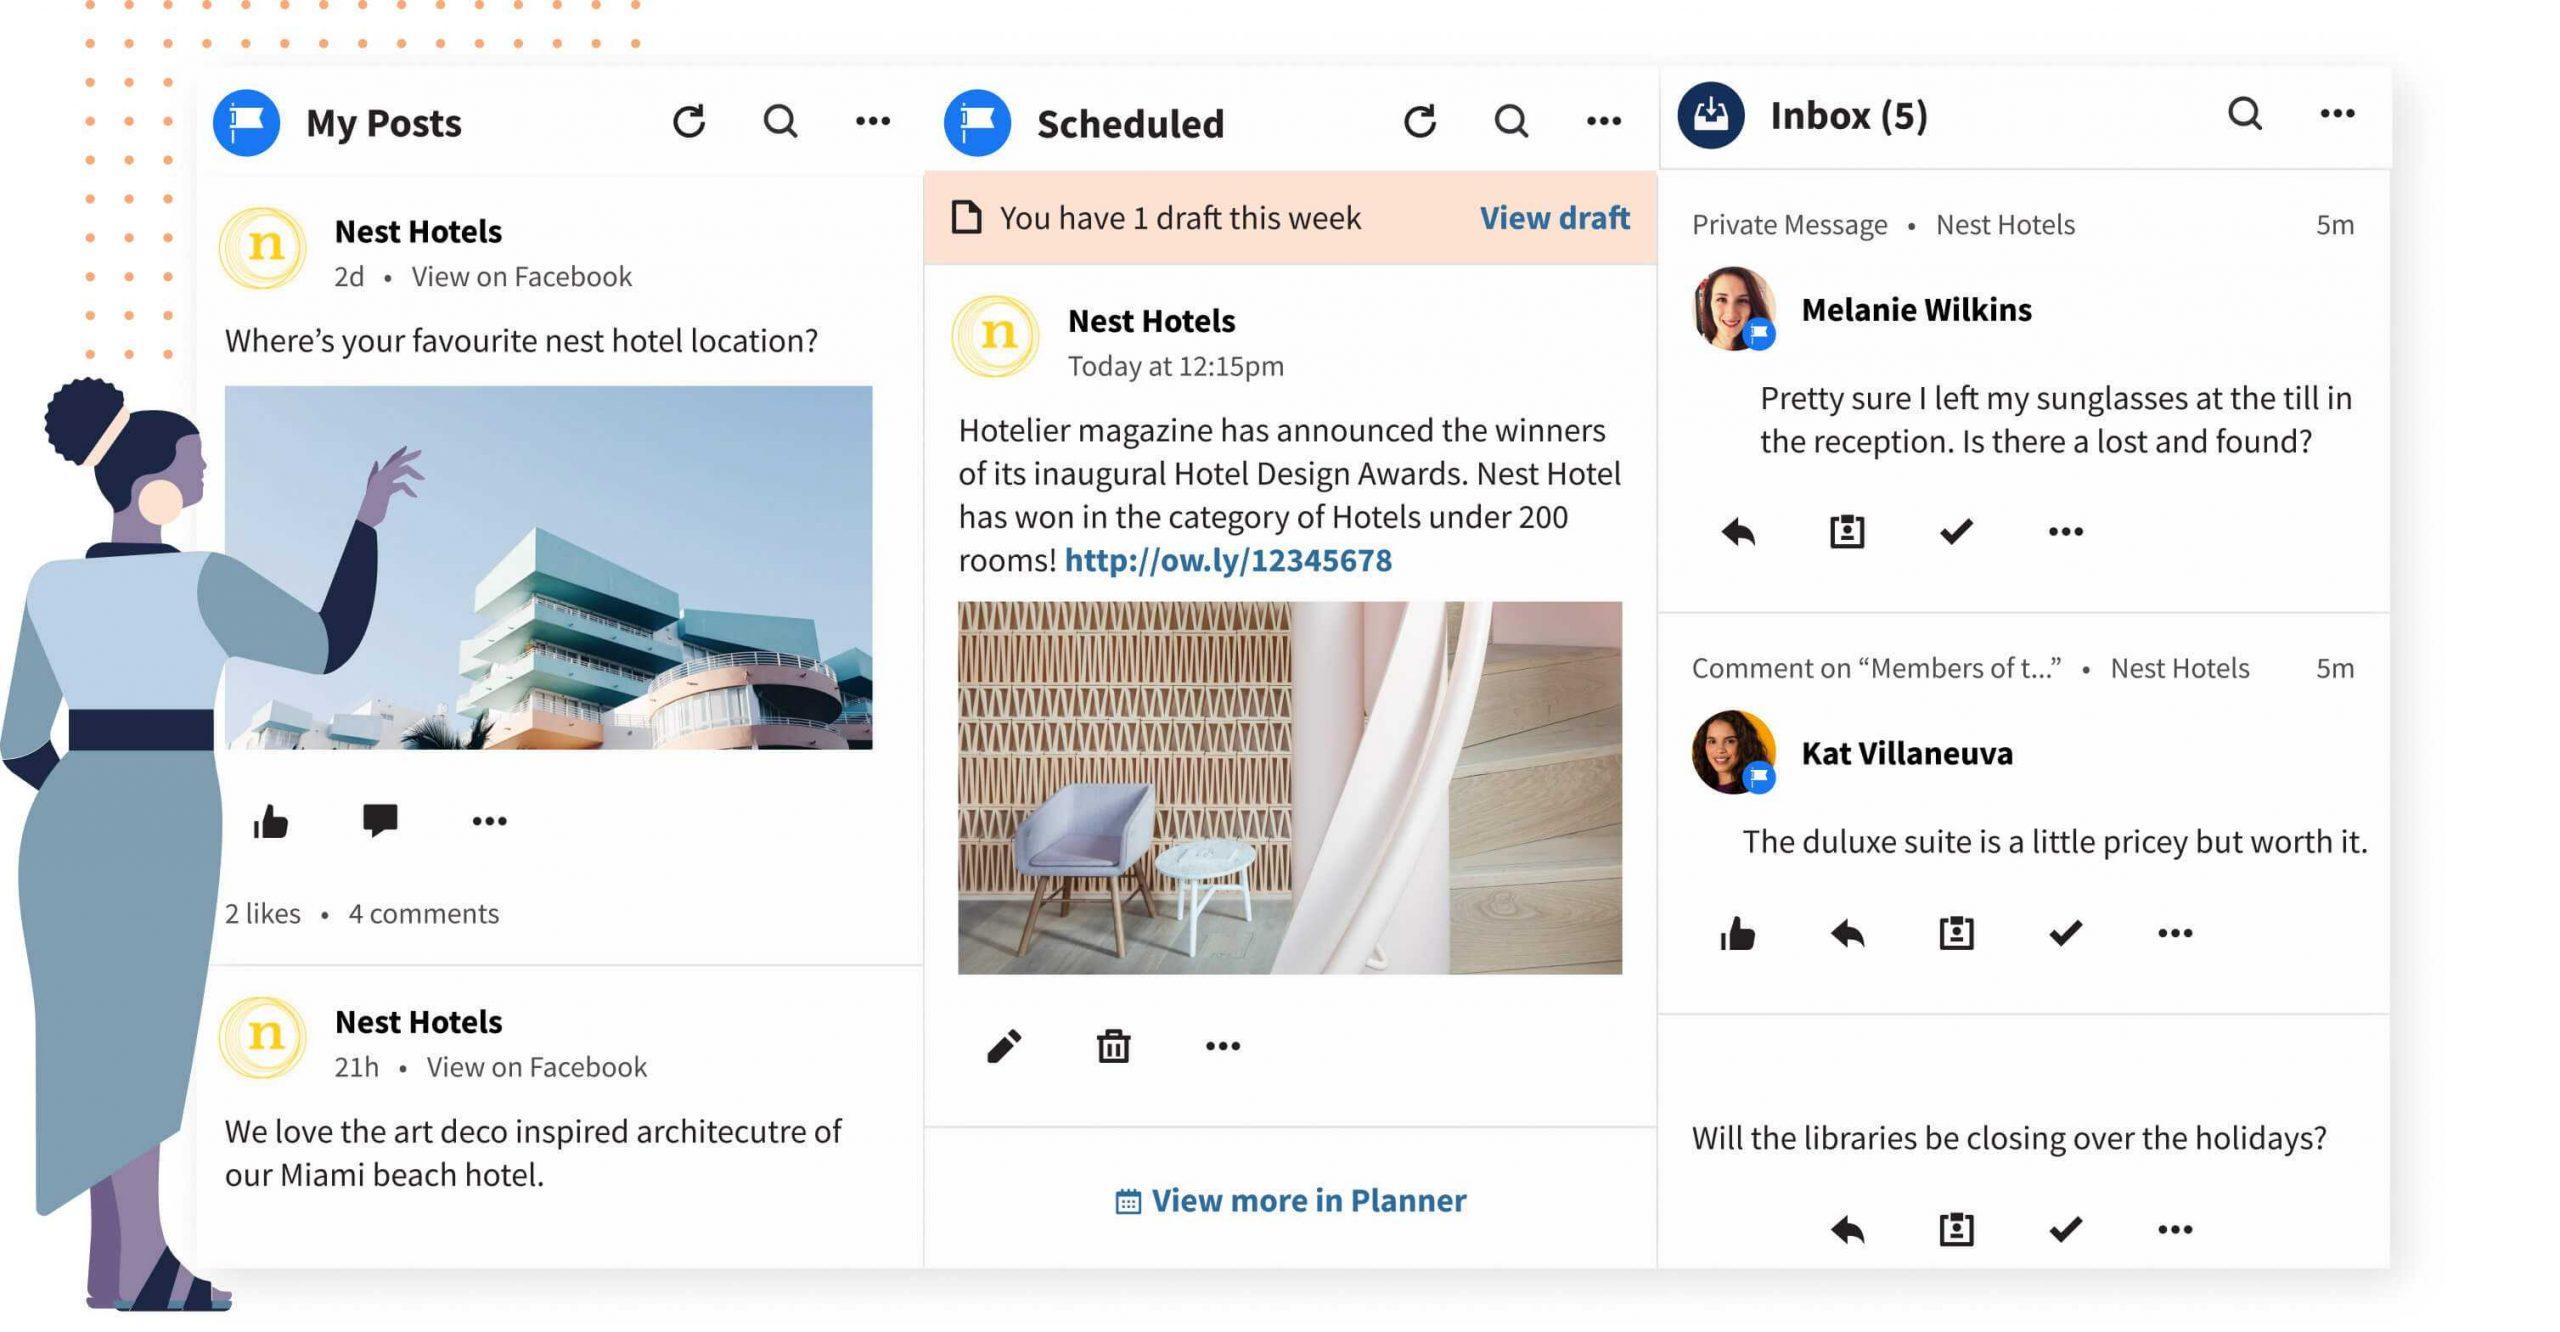 hootsuite social analytics tool